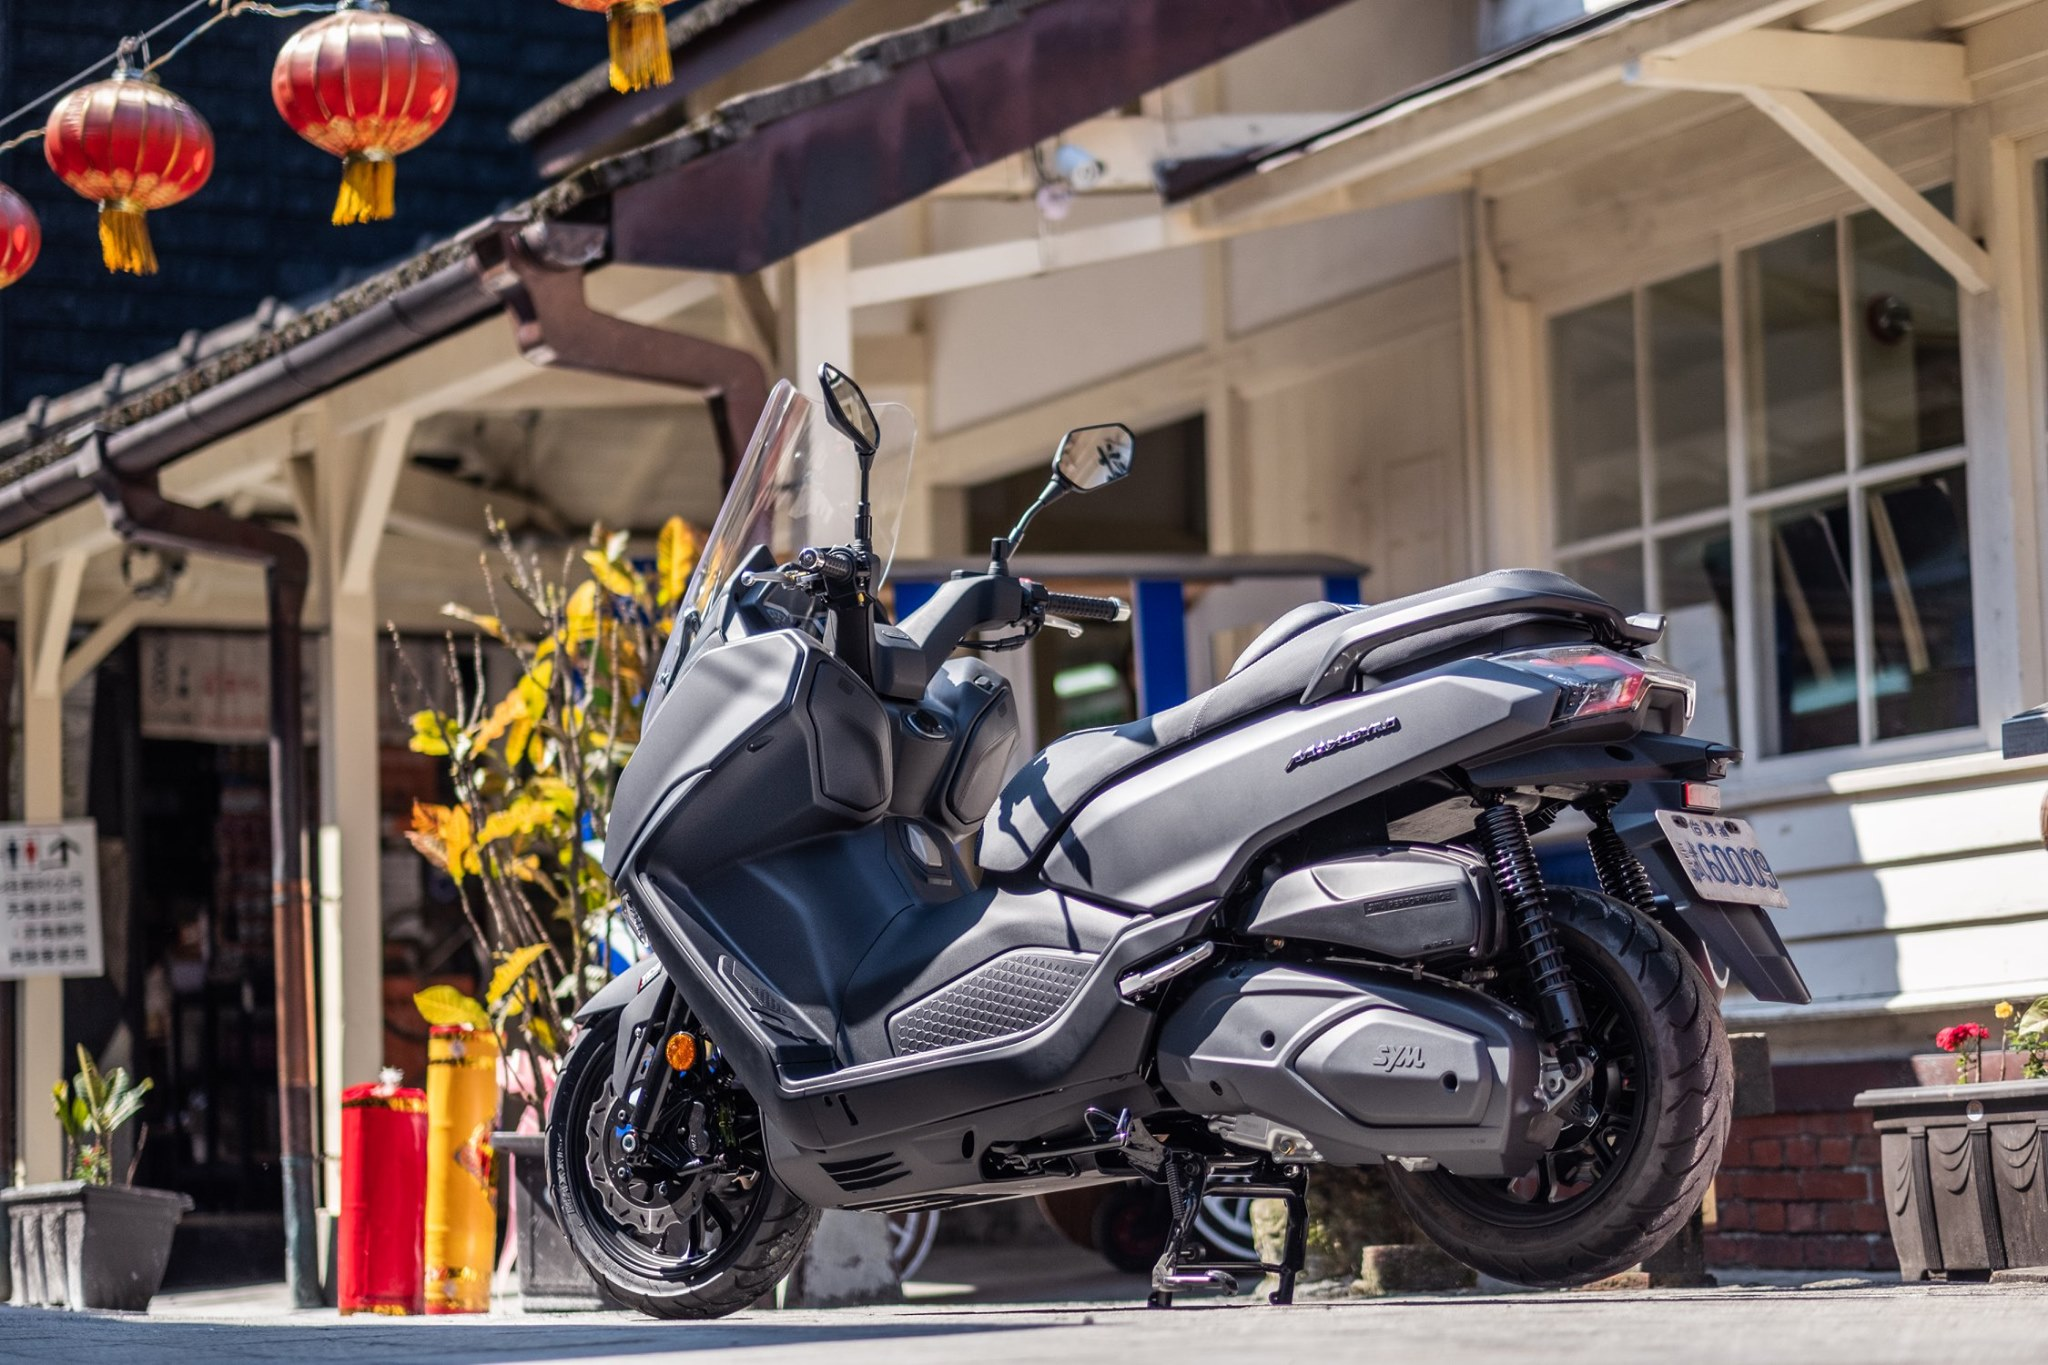 Sym Maxsym 400 Maxi-Scooter